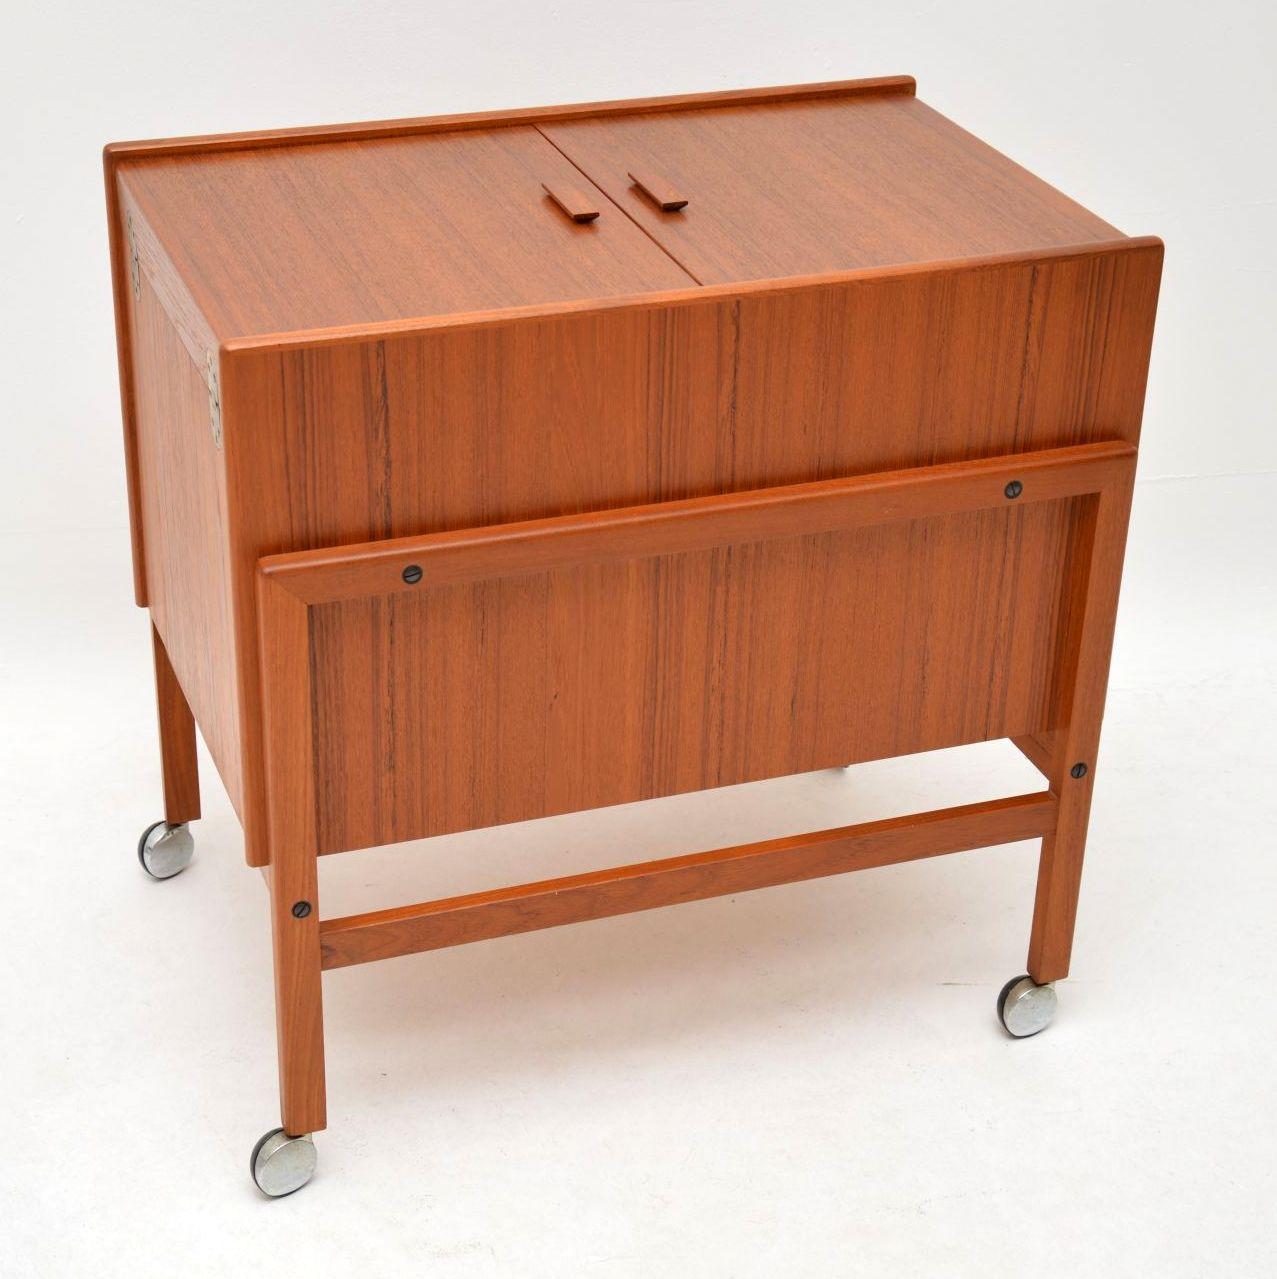 danish teak retro vintage drinks trolley bar cart arrebo mobler andreas hansen